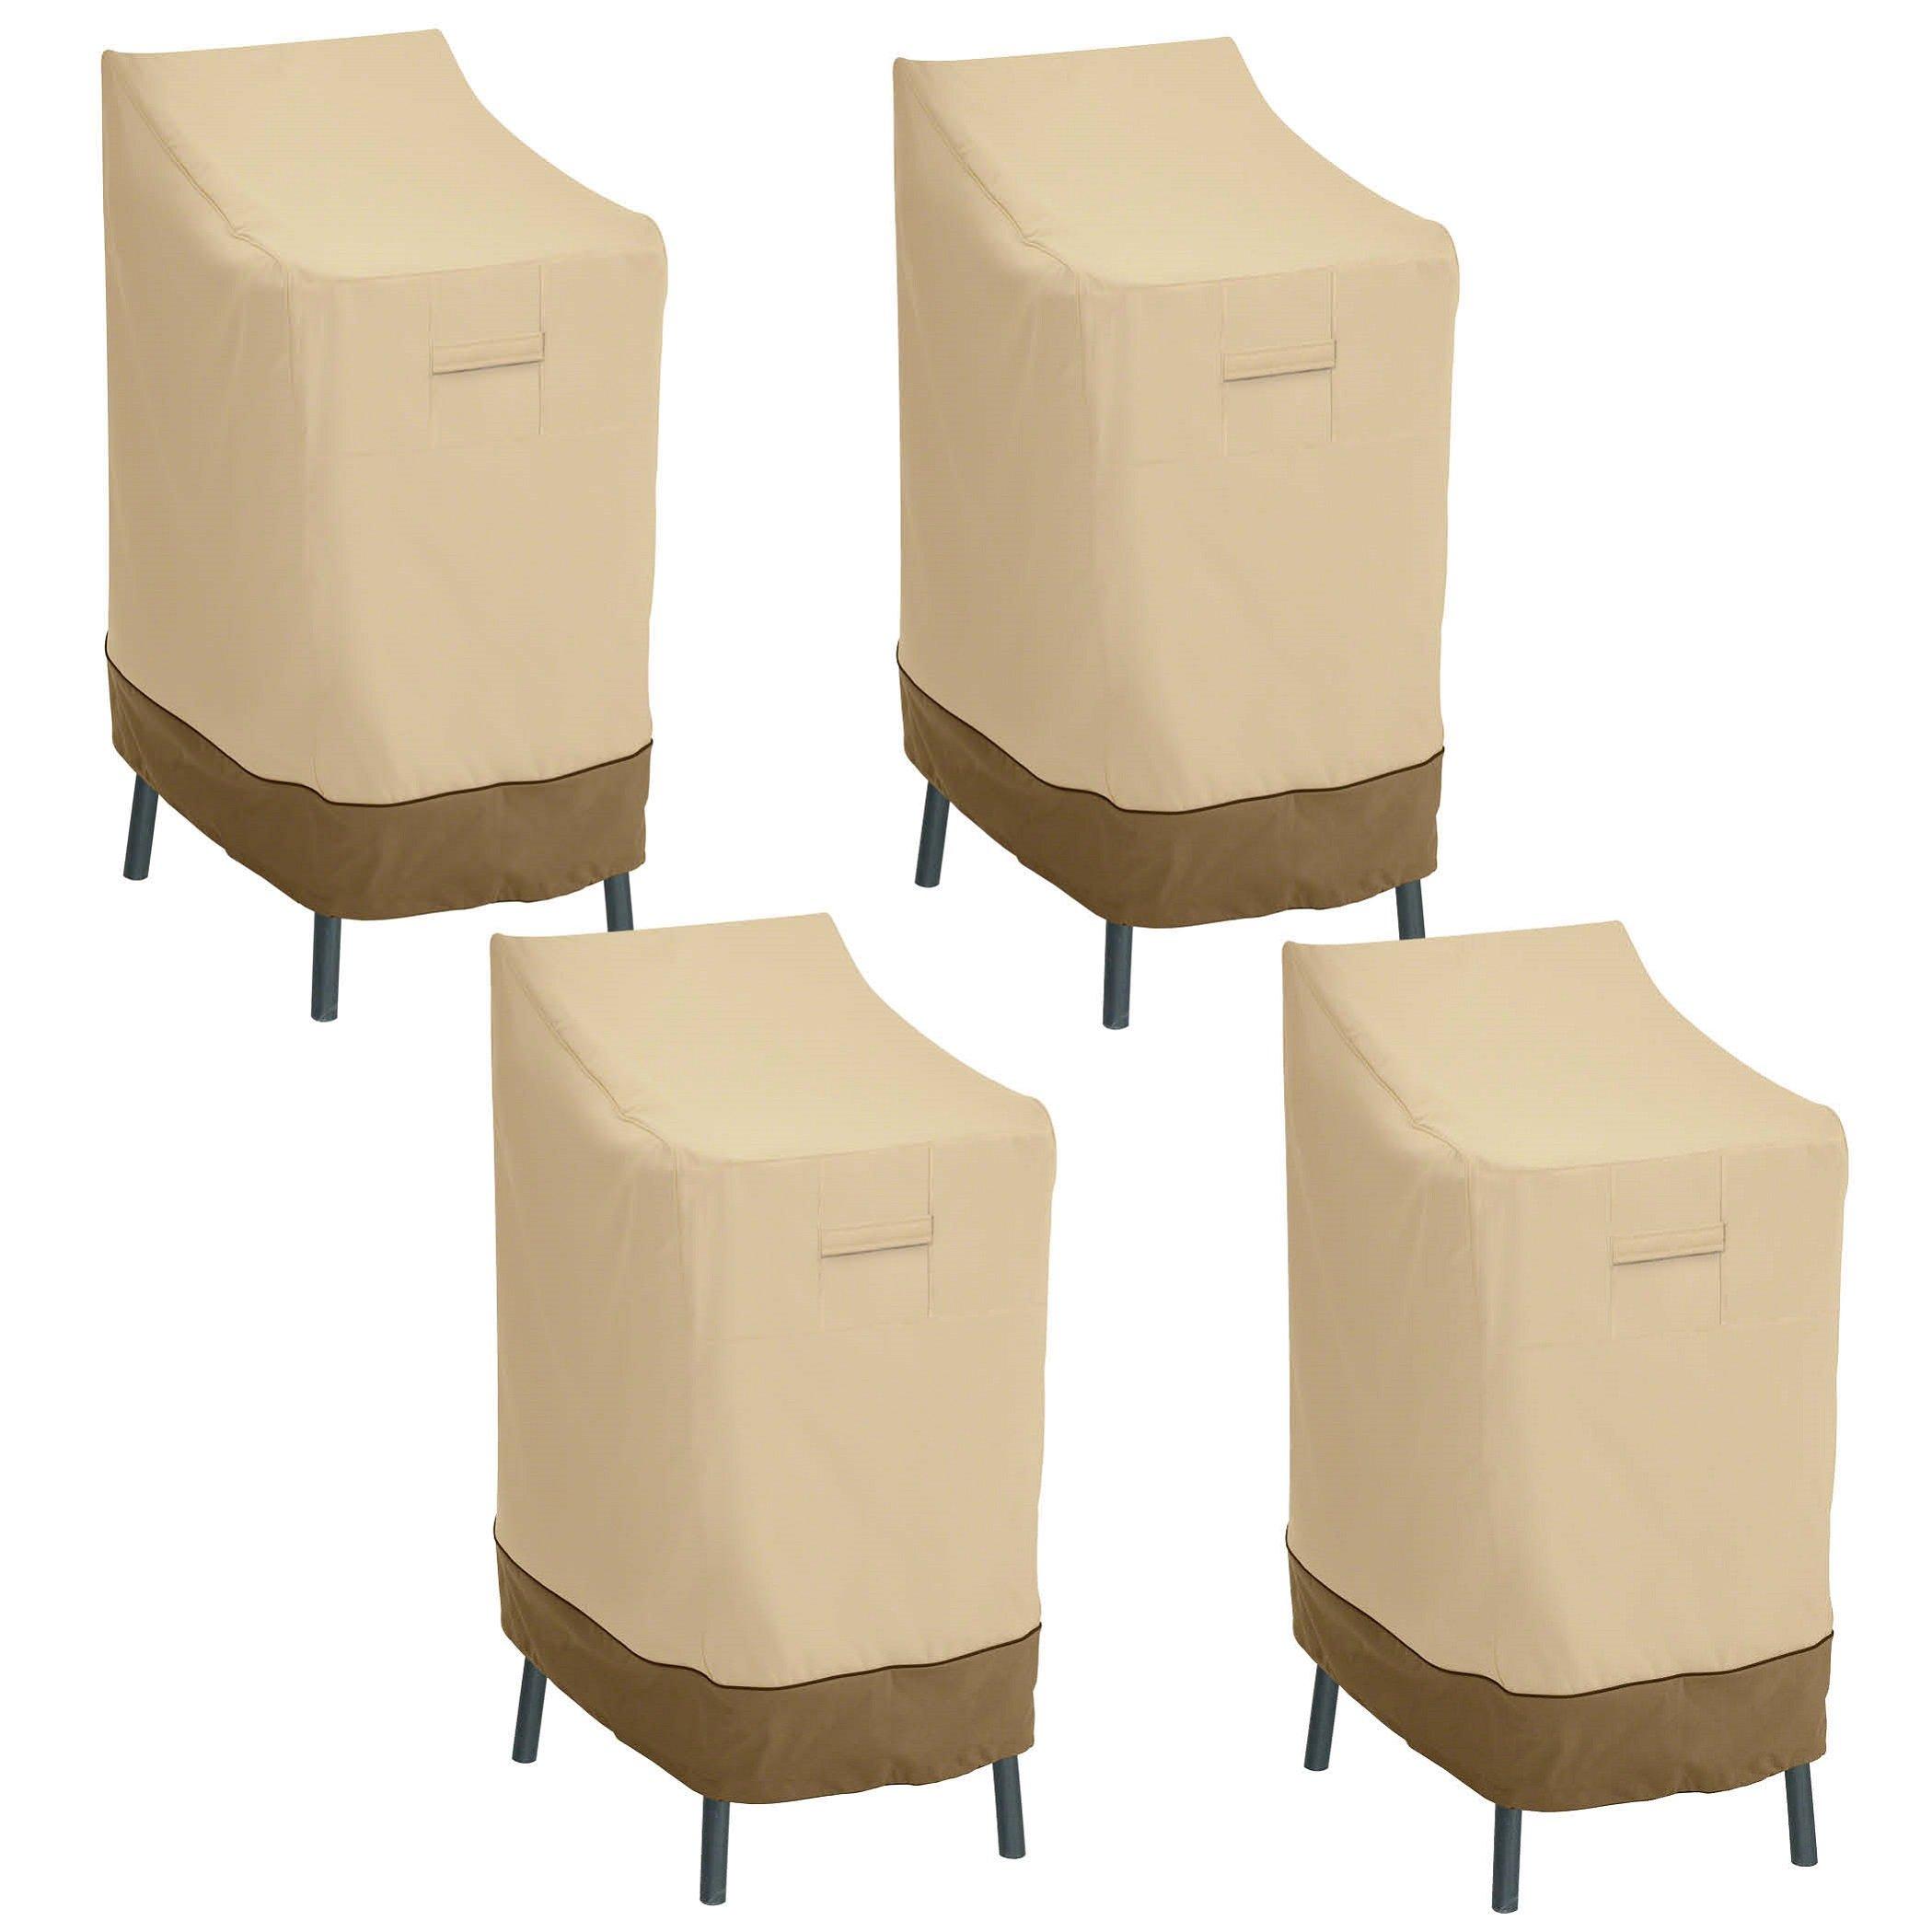 Classic Accessories 55-642-011501-4PK Veranda Patio Bar Chair/Stool Cover (4-Pack)